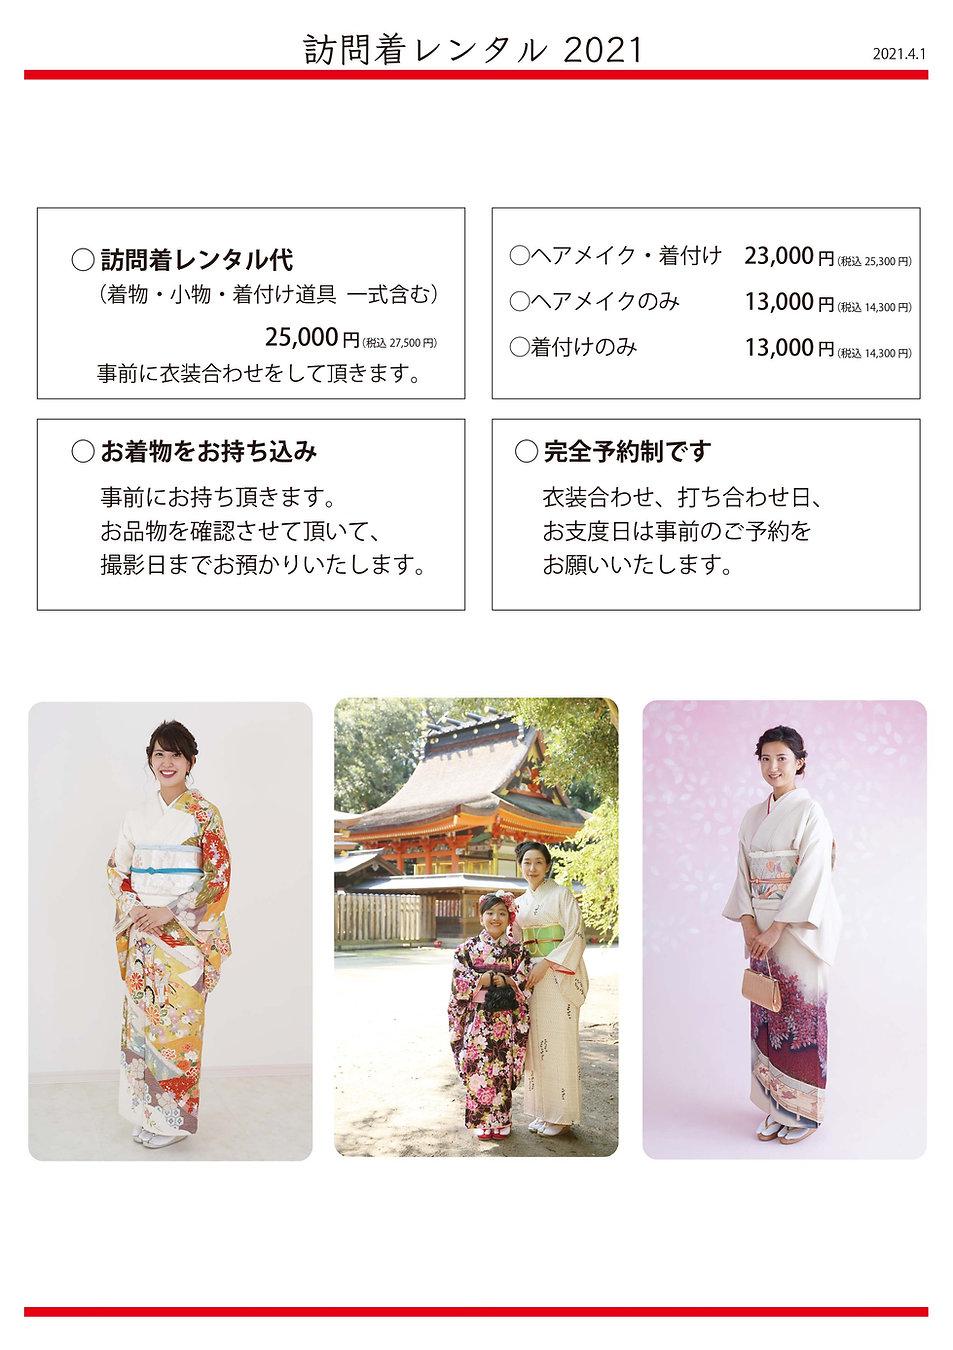 kimono_rental_2021.jpg